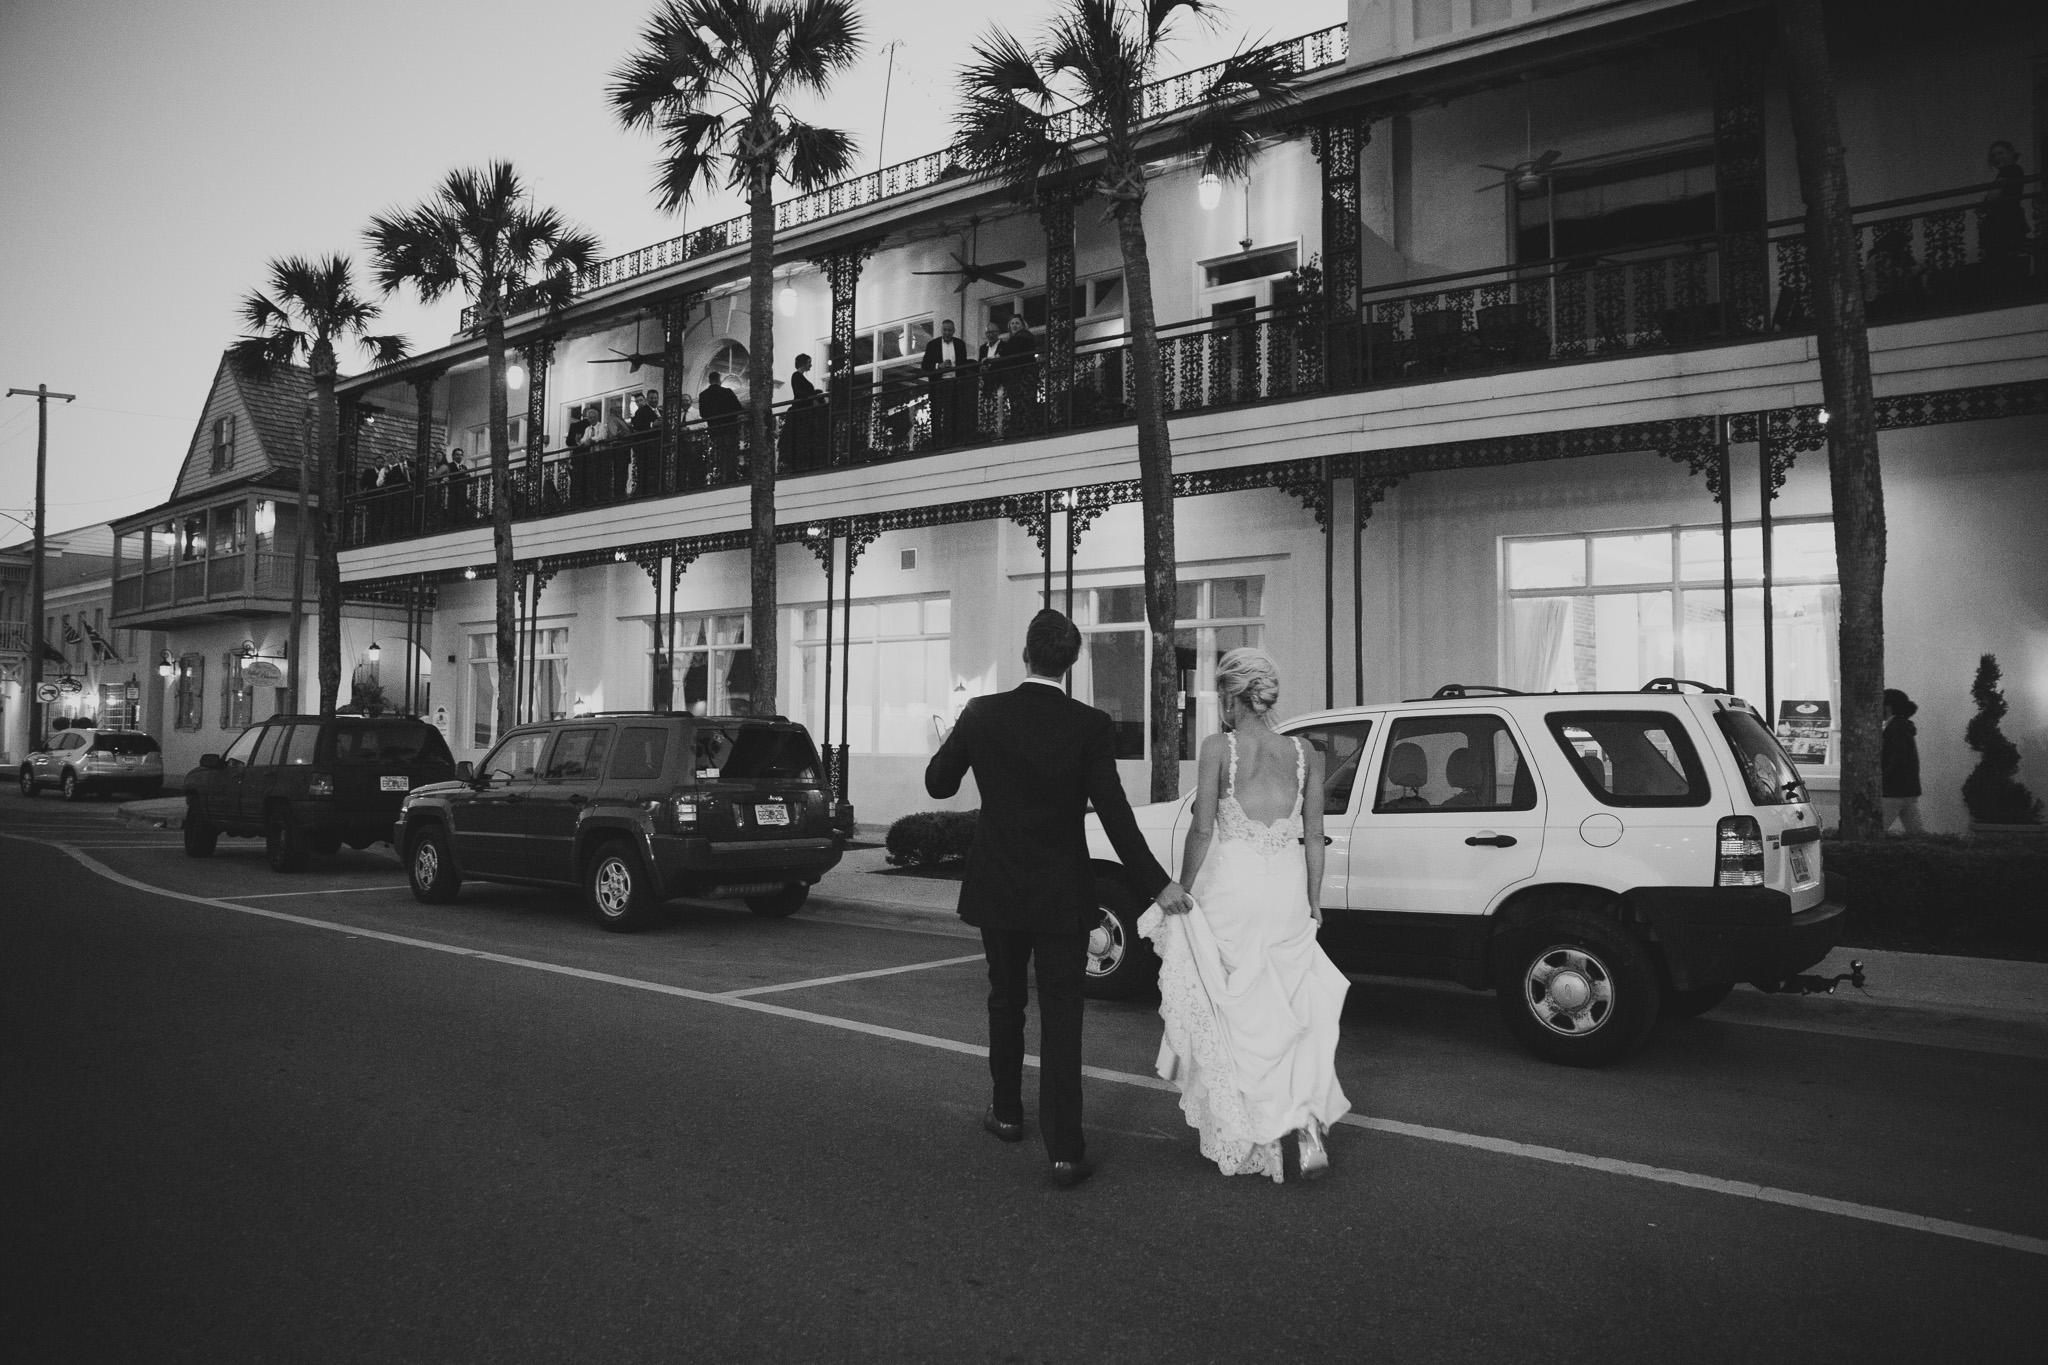 white-room-wedding-venue-st-augustine-florida-waterfront-views